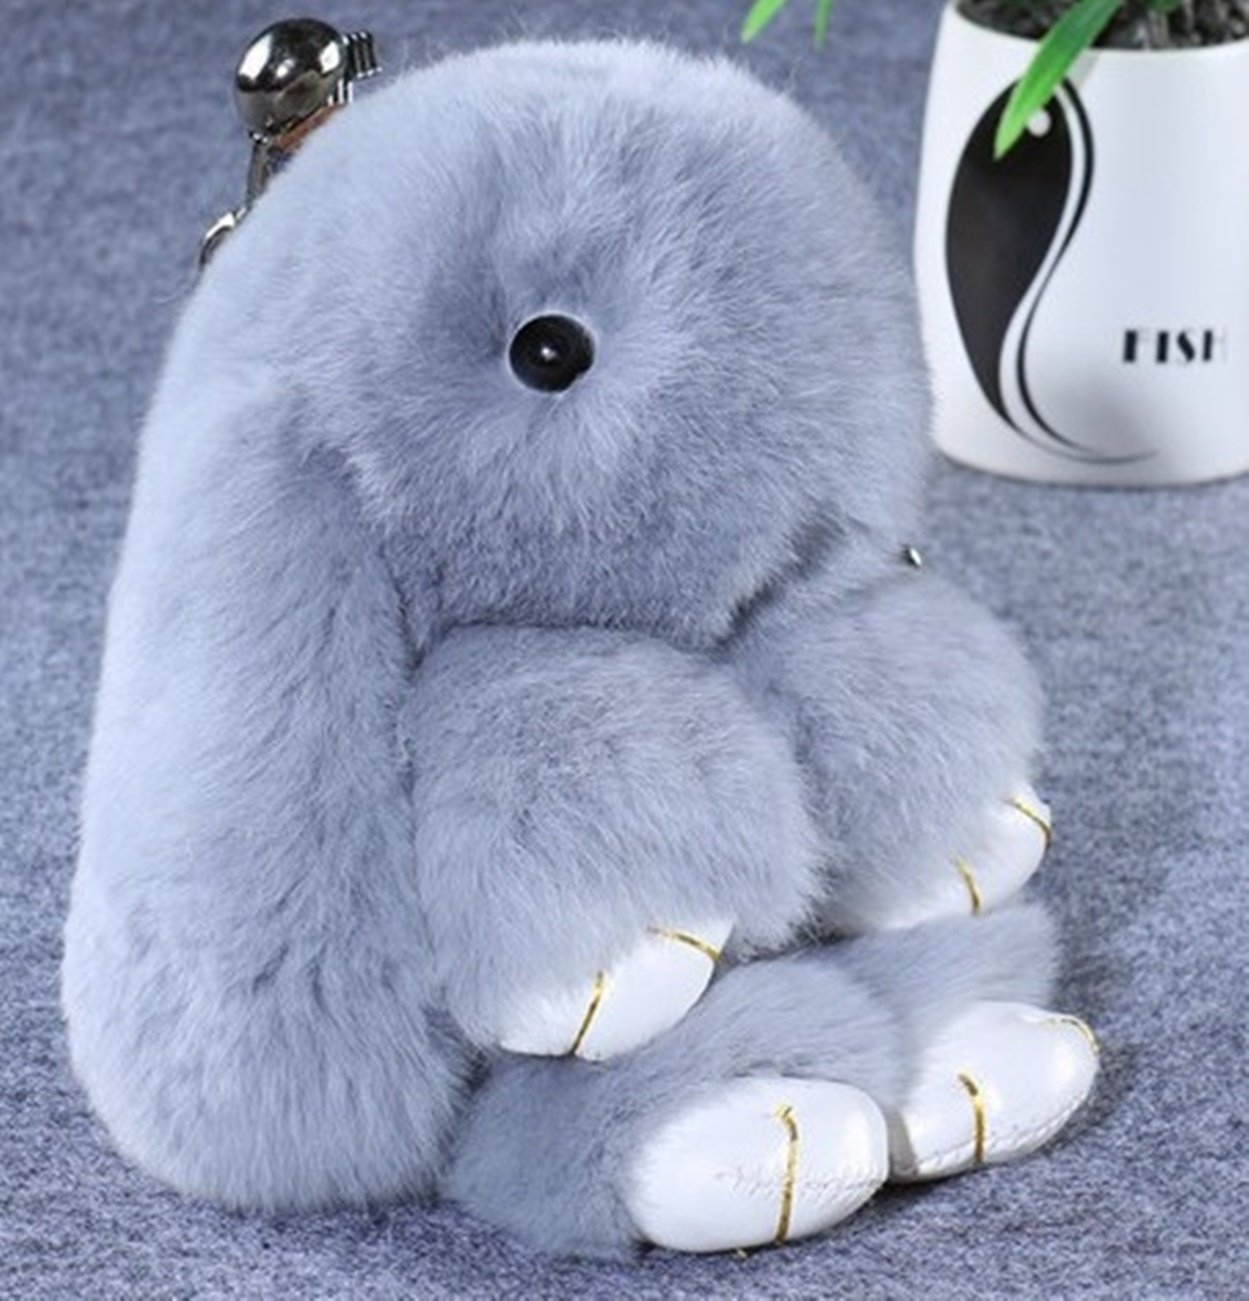 89a3d4e4a 1 Pcs Mini Pocket Violet Fluffy Rabbit Keychain Keyring Keyfob Bunny Fur  Pom Plush Ornament Pendant Keys Chains Rings Tags Strap Wrist Wonderful  Popular ...